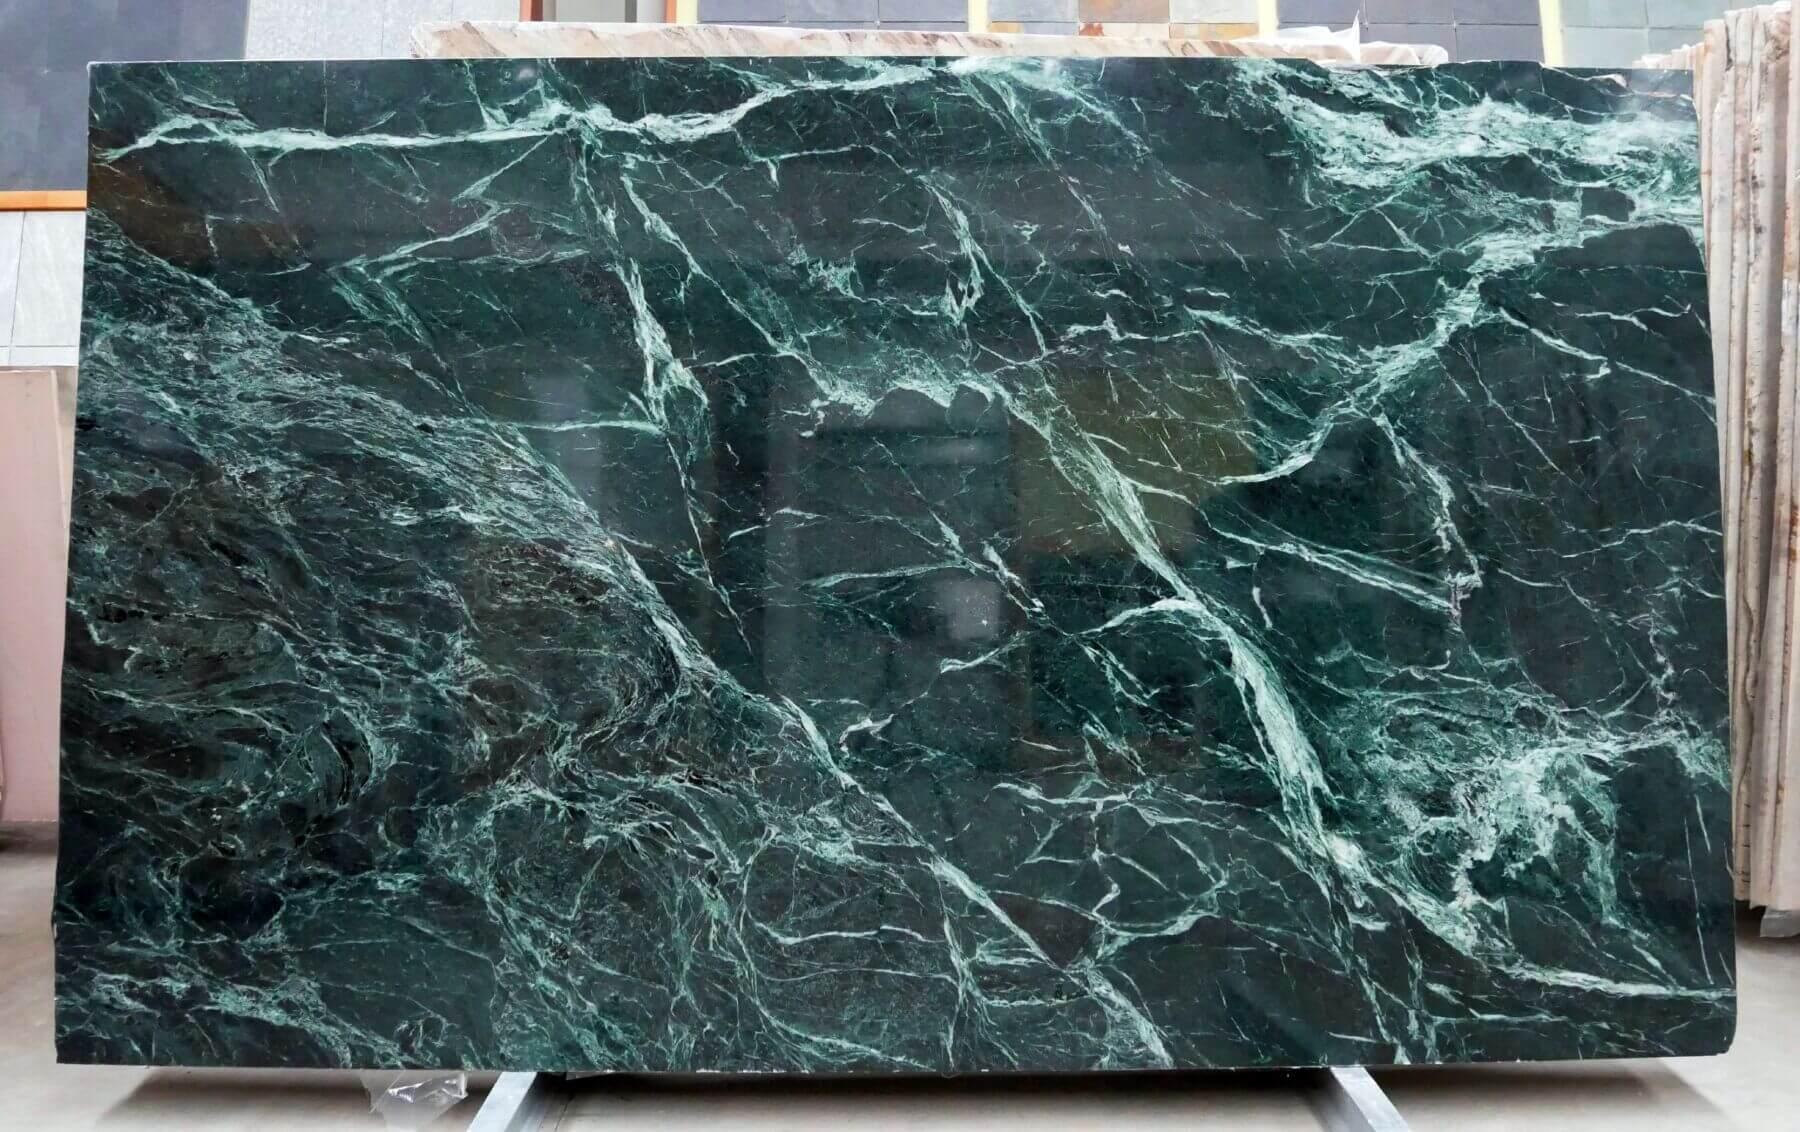 12953 200-285x166-172x2cm 75 polished sl